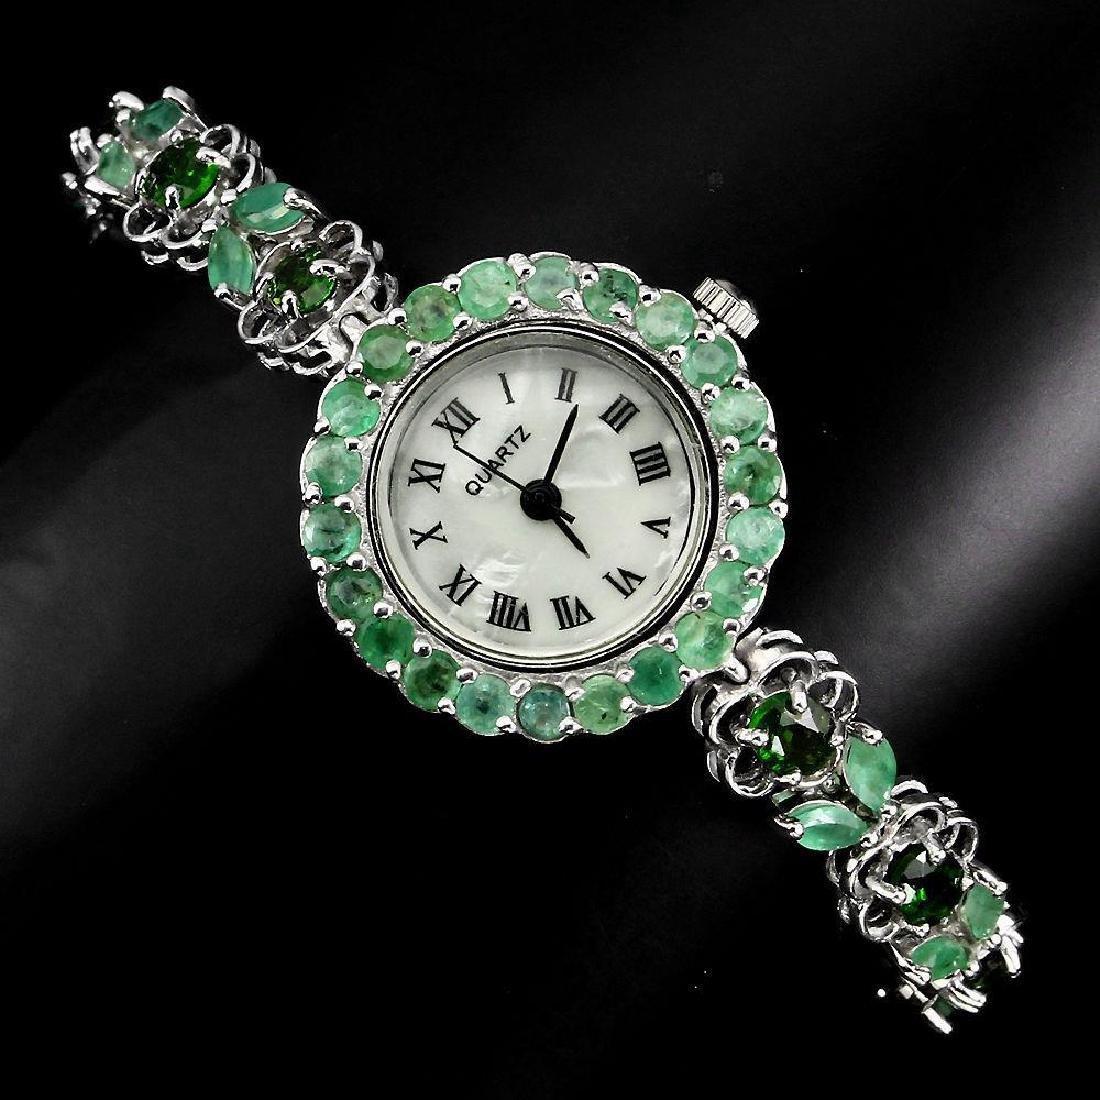 Sterling Silver Emerald & Tourmaline Watch, 8.11ctw